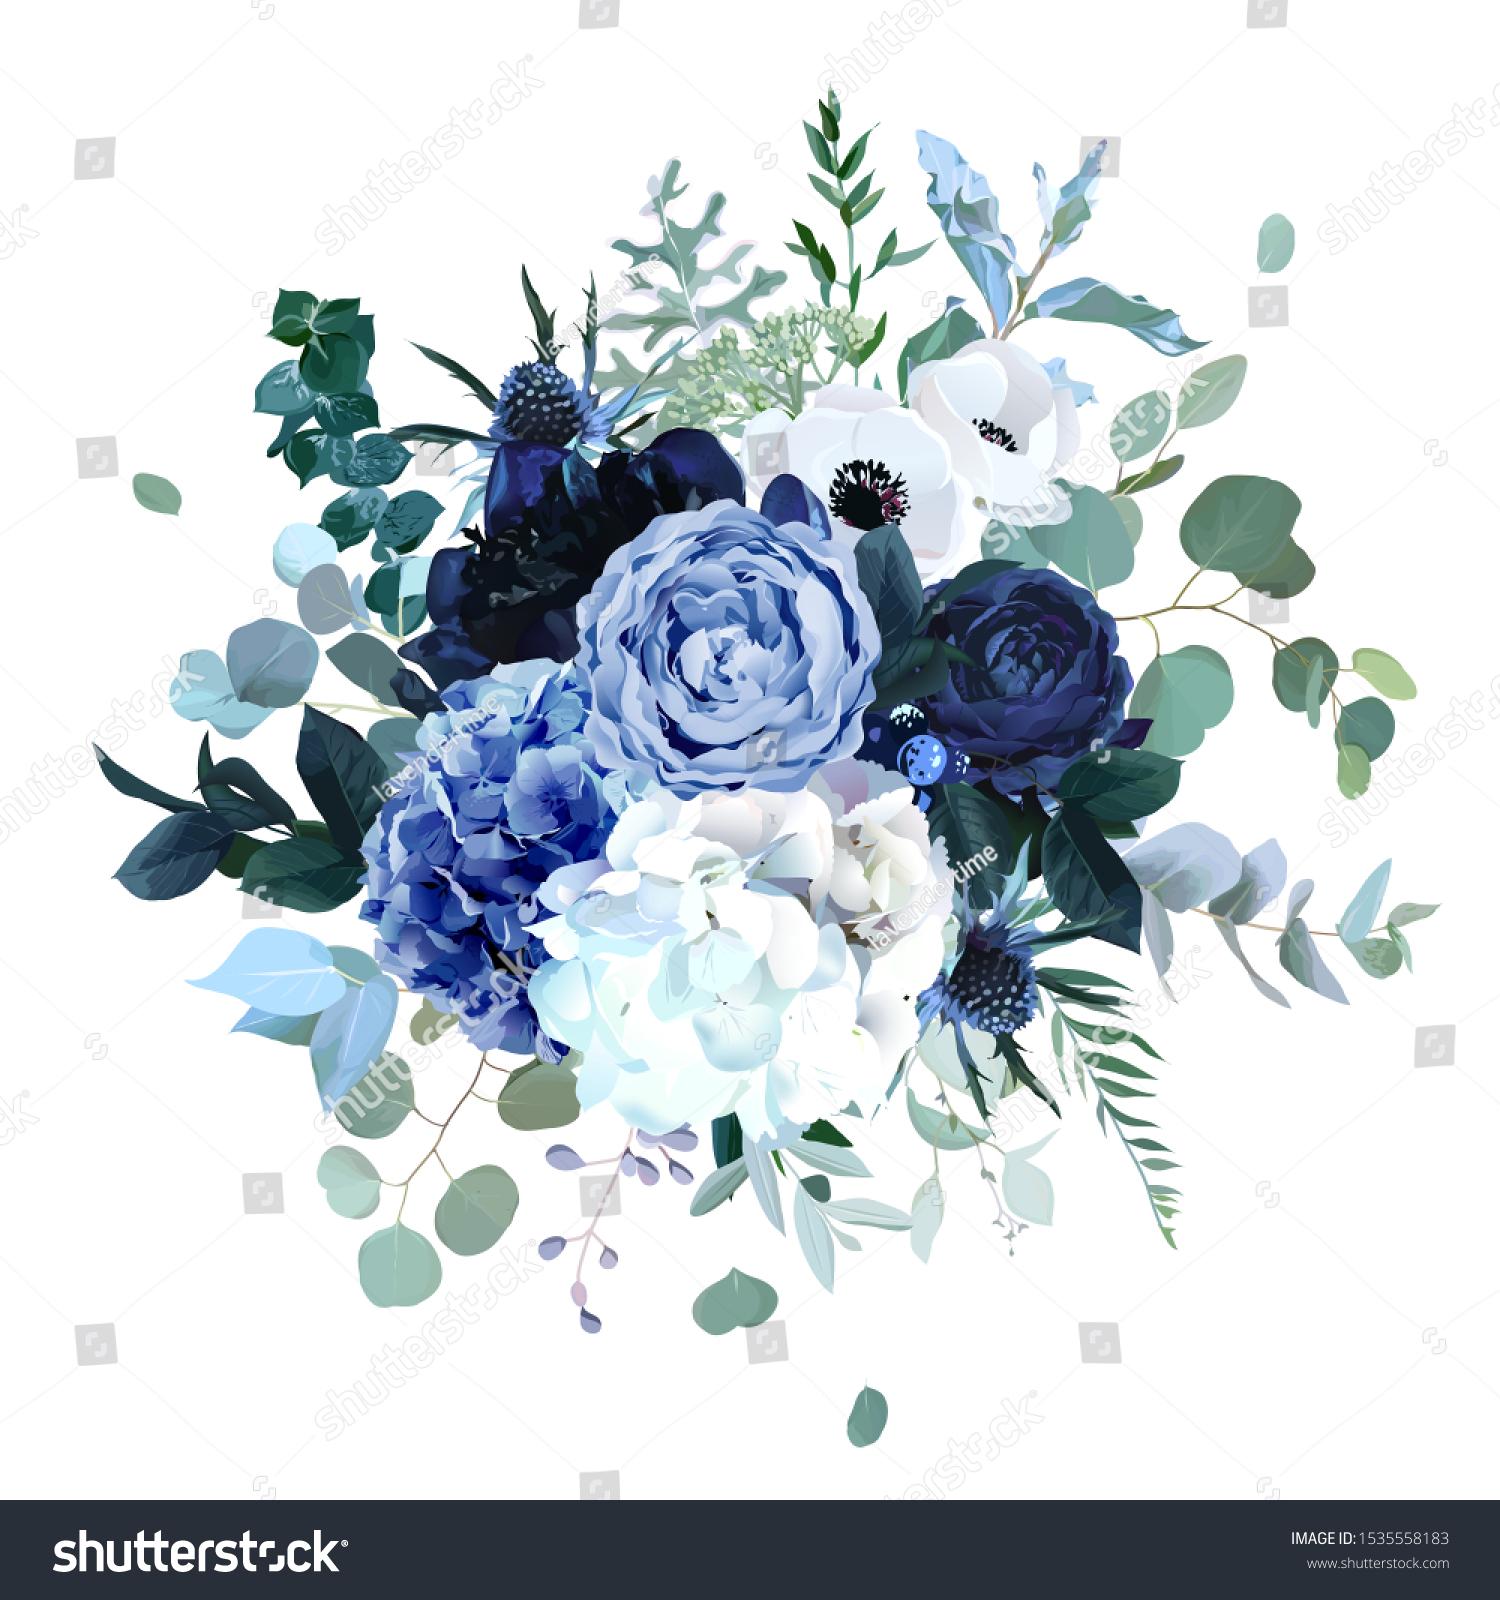 Verde Azulado Apliques De Flores Flores de Satén Rosa Offray Enrollado x 10 piezas de jade azul Moss